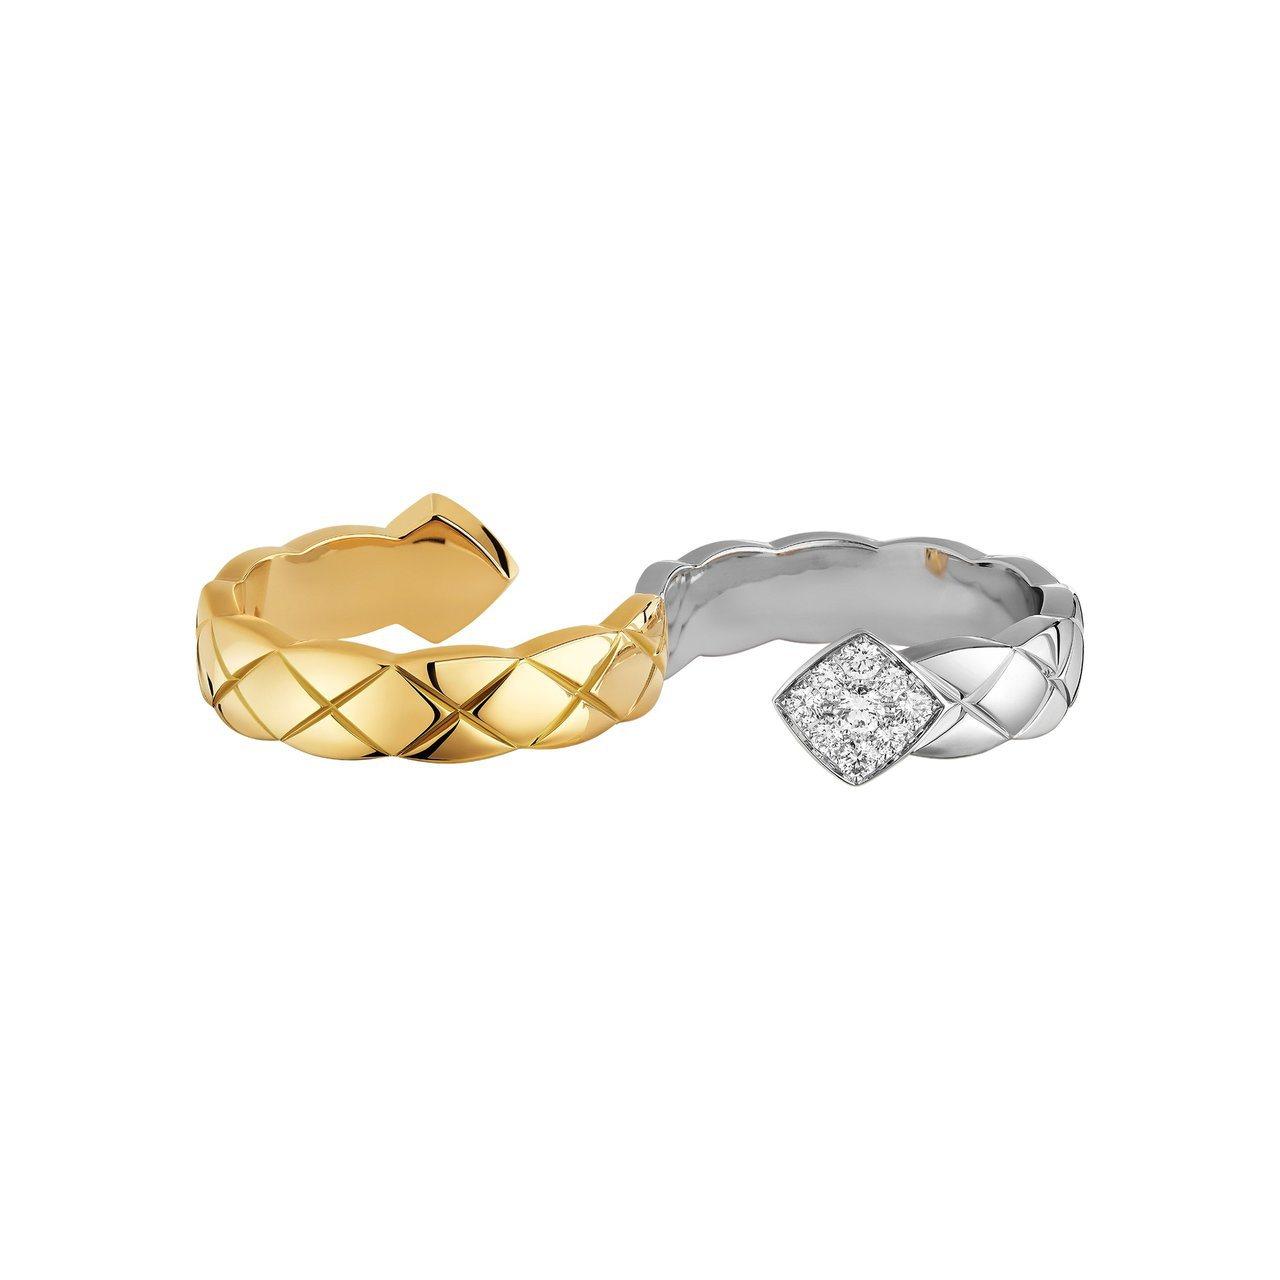 Coco Crush指間戒,18K白金與黃金鑲嵌鑽石,21萬元0,000。圖/香...